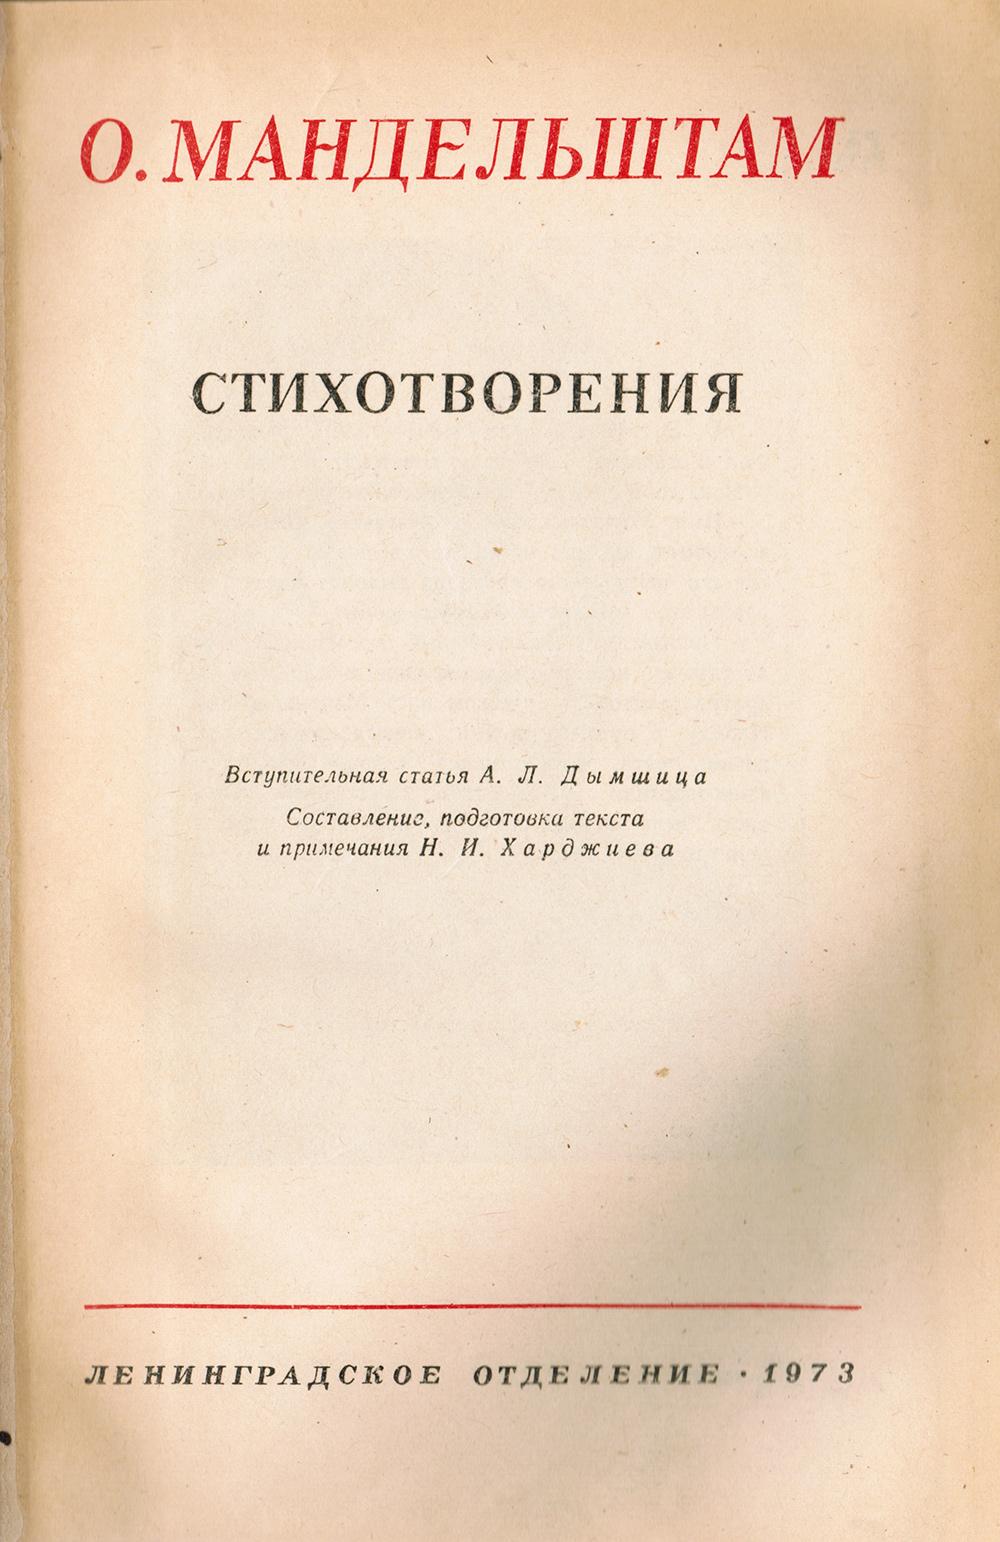 Сборник Мандельштама 73-го года (